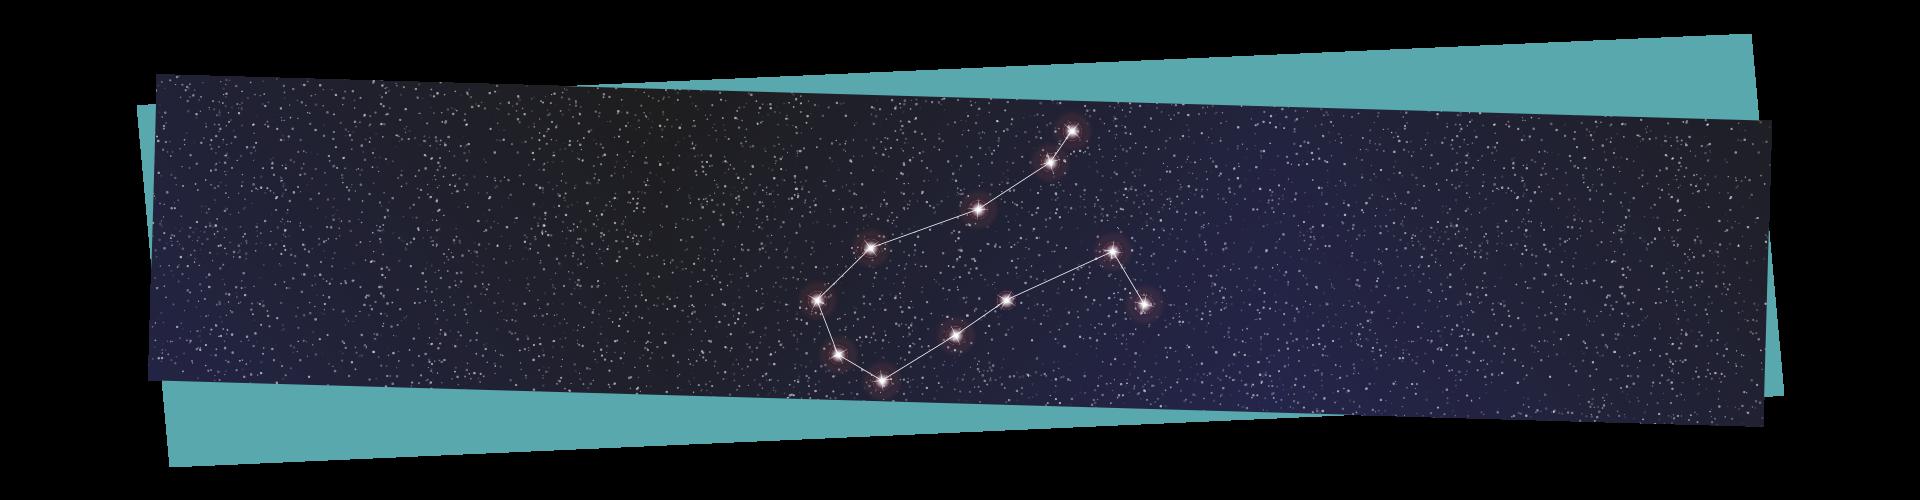 Winter stargazing - Gemini constellation